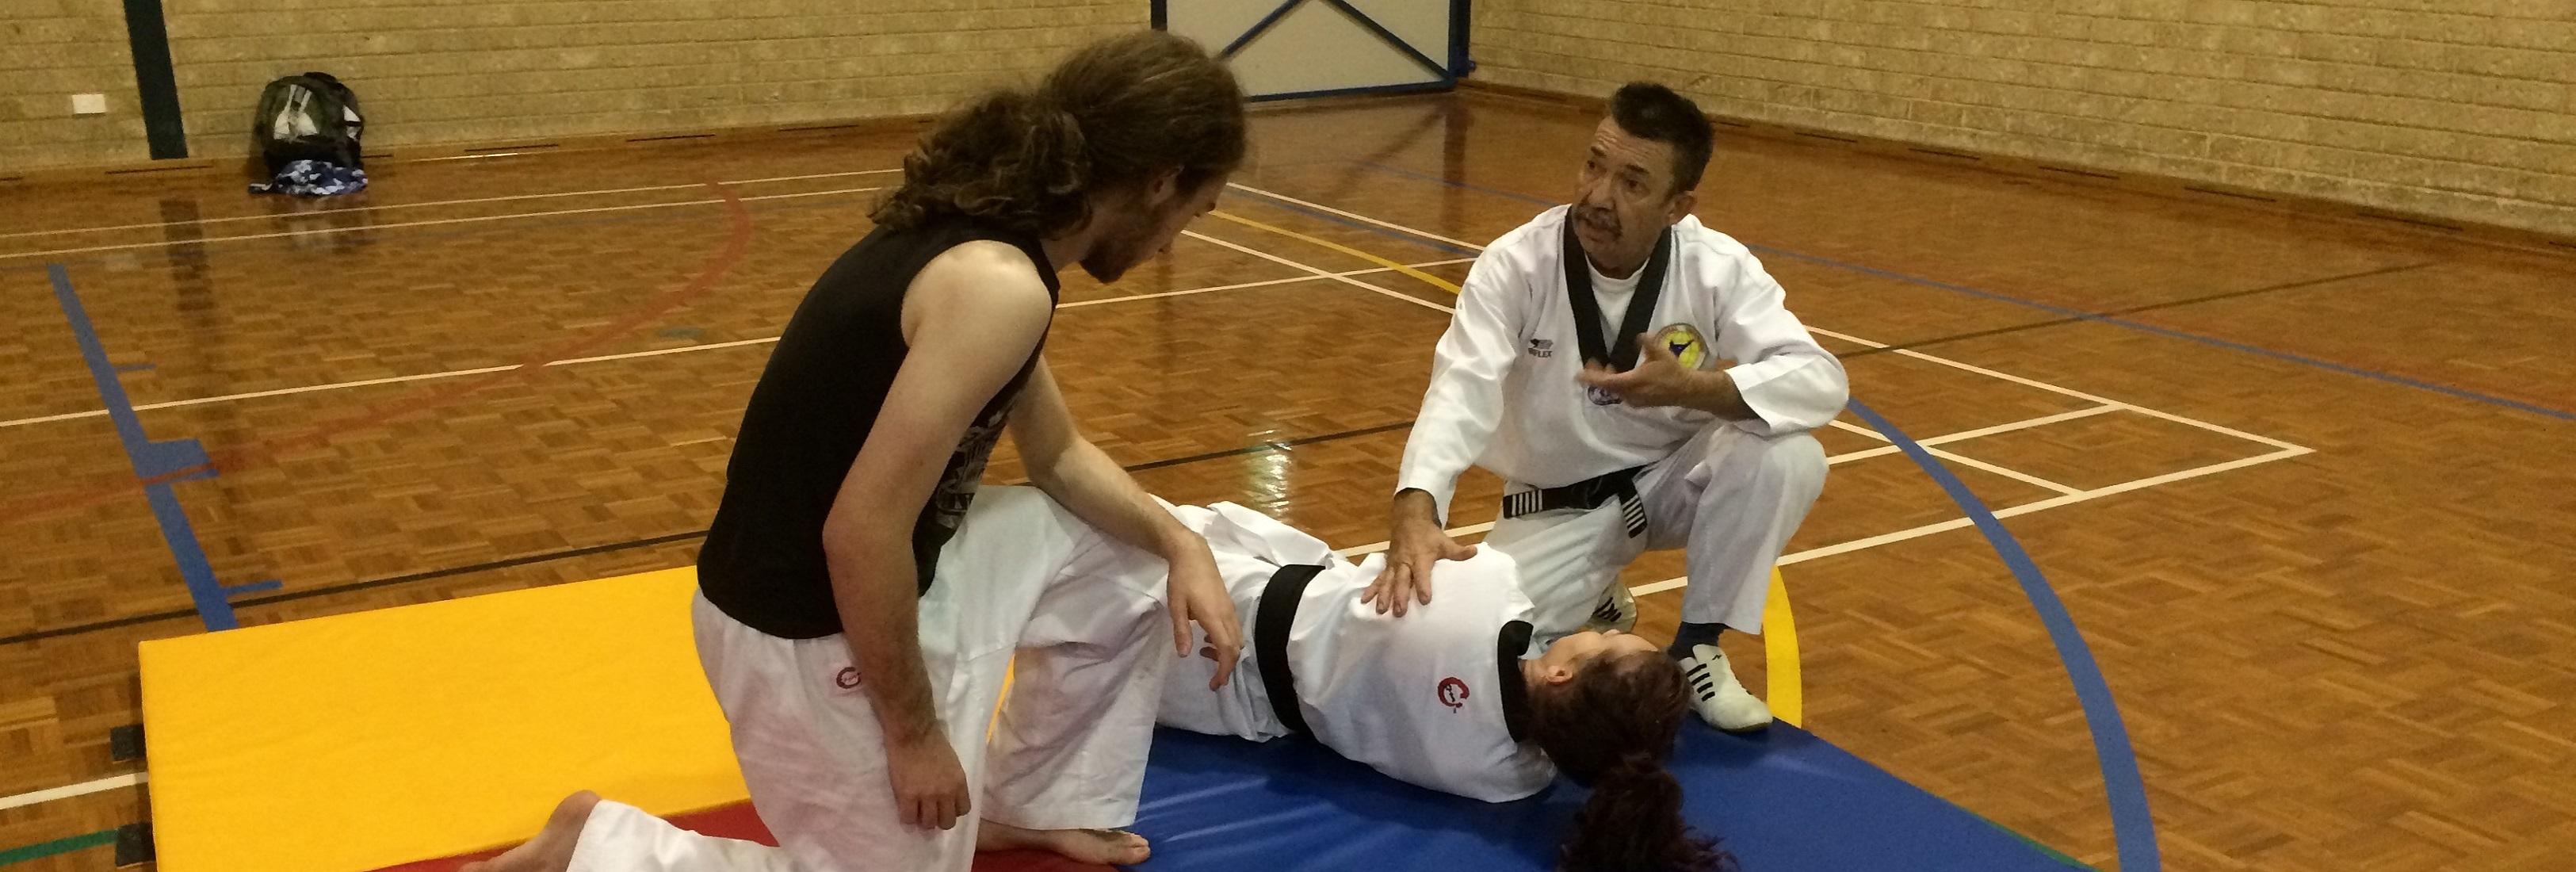 receive quality instruction at scarborough taekwondo